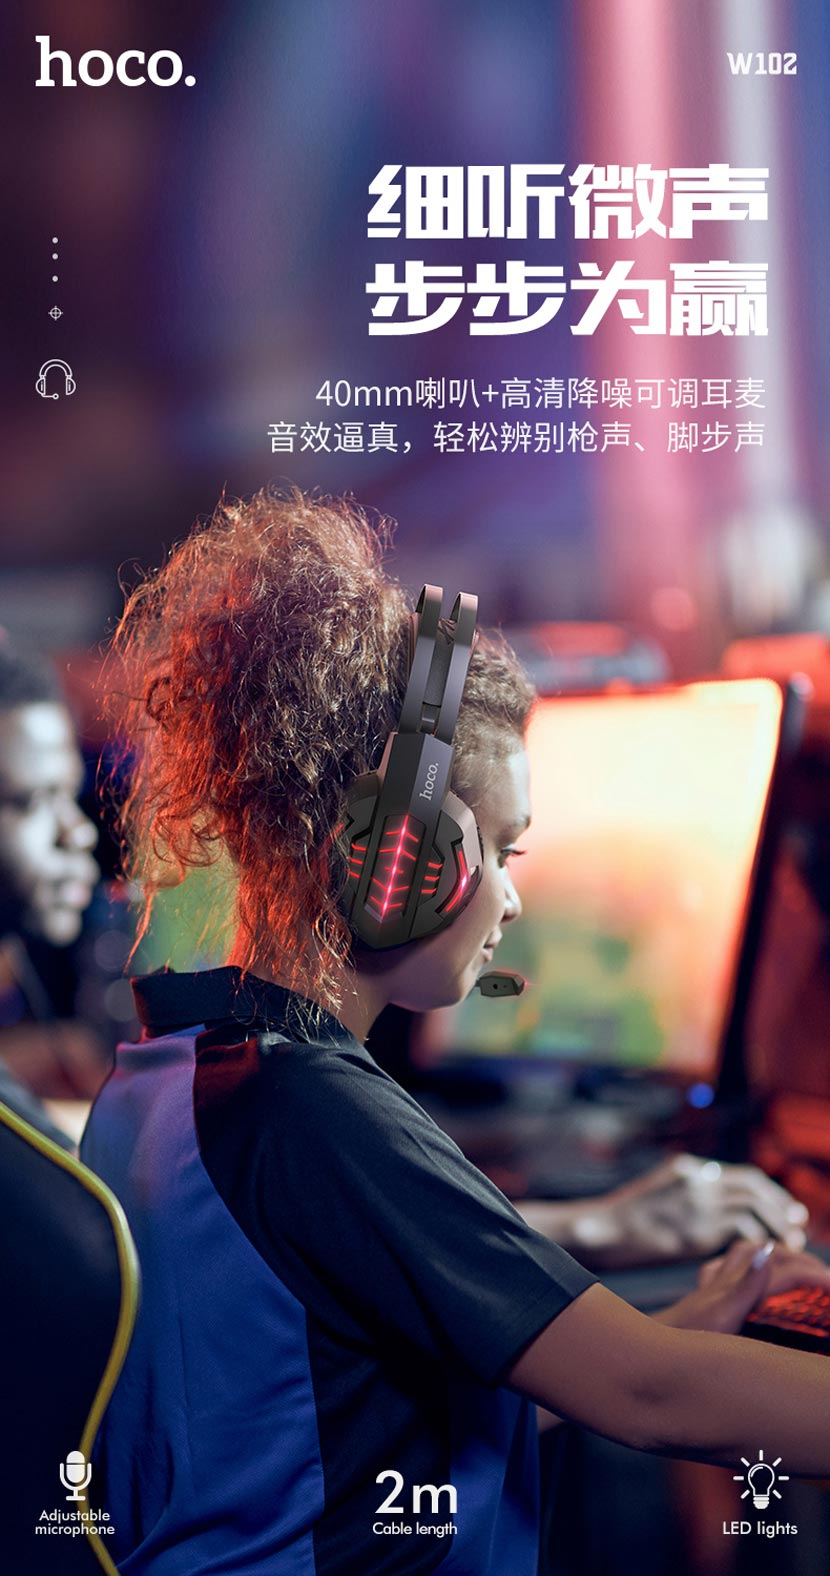 hoco news w102 cool tour gaming headphones win cn